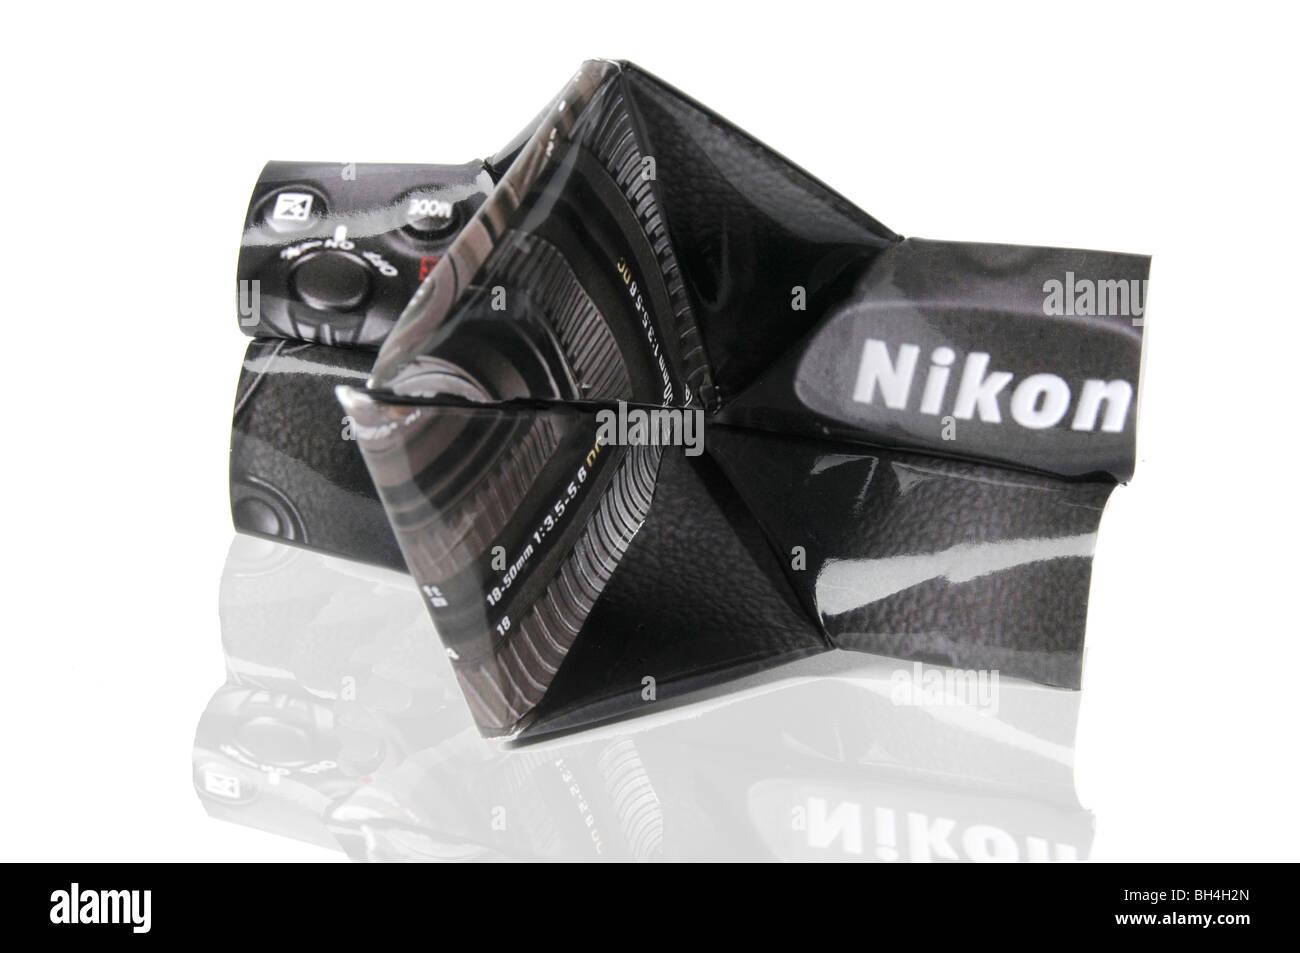 Origami Camera - Nikon D300. Studio shot on white background - Stock Image